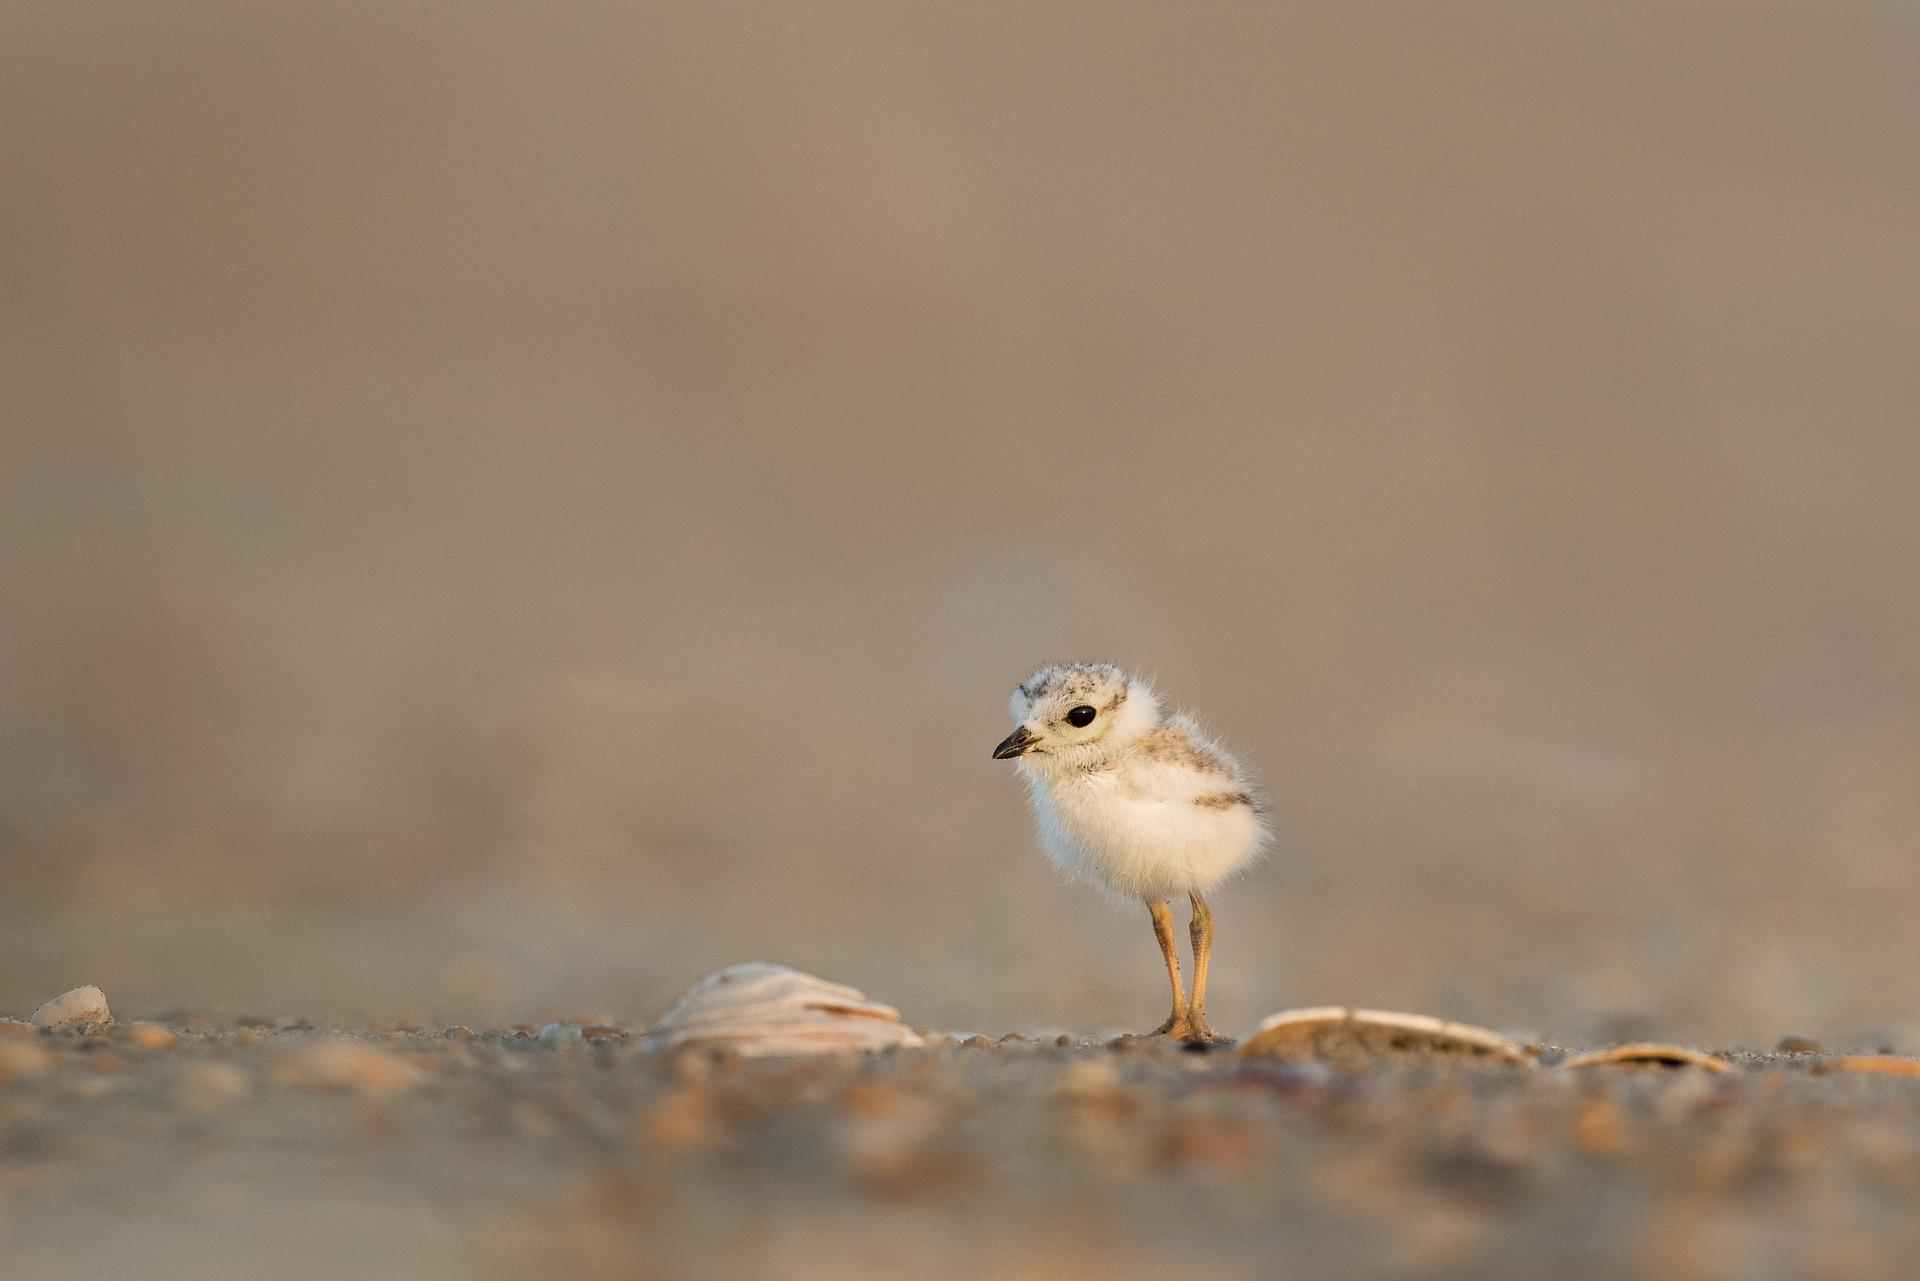 Chick bird spring vulnerability trust - CC image via pixabay.jpg